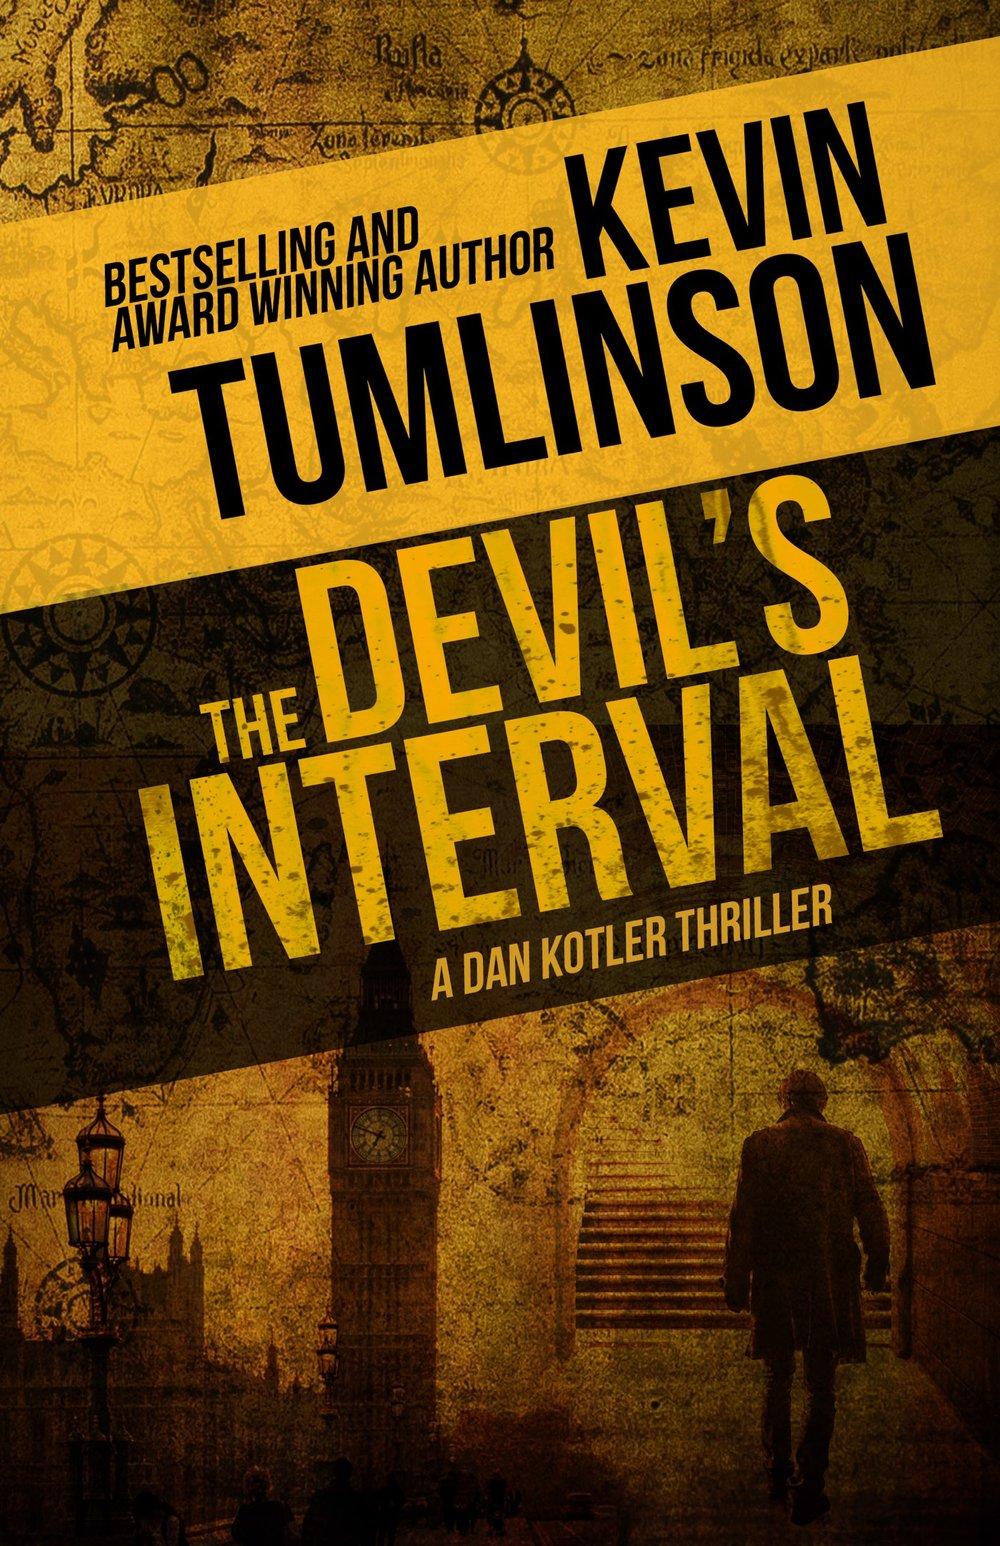 The-Devils-Interval-Generic.jpg